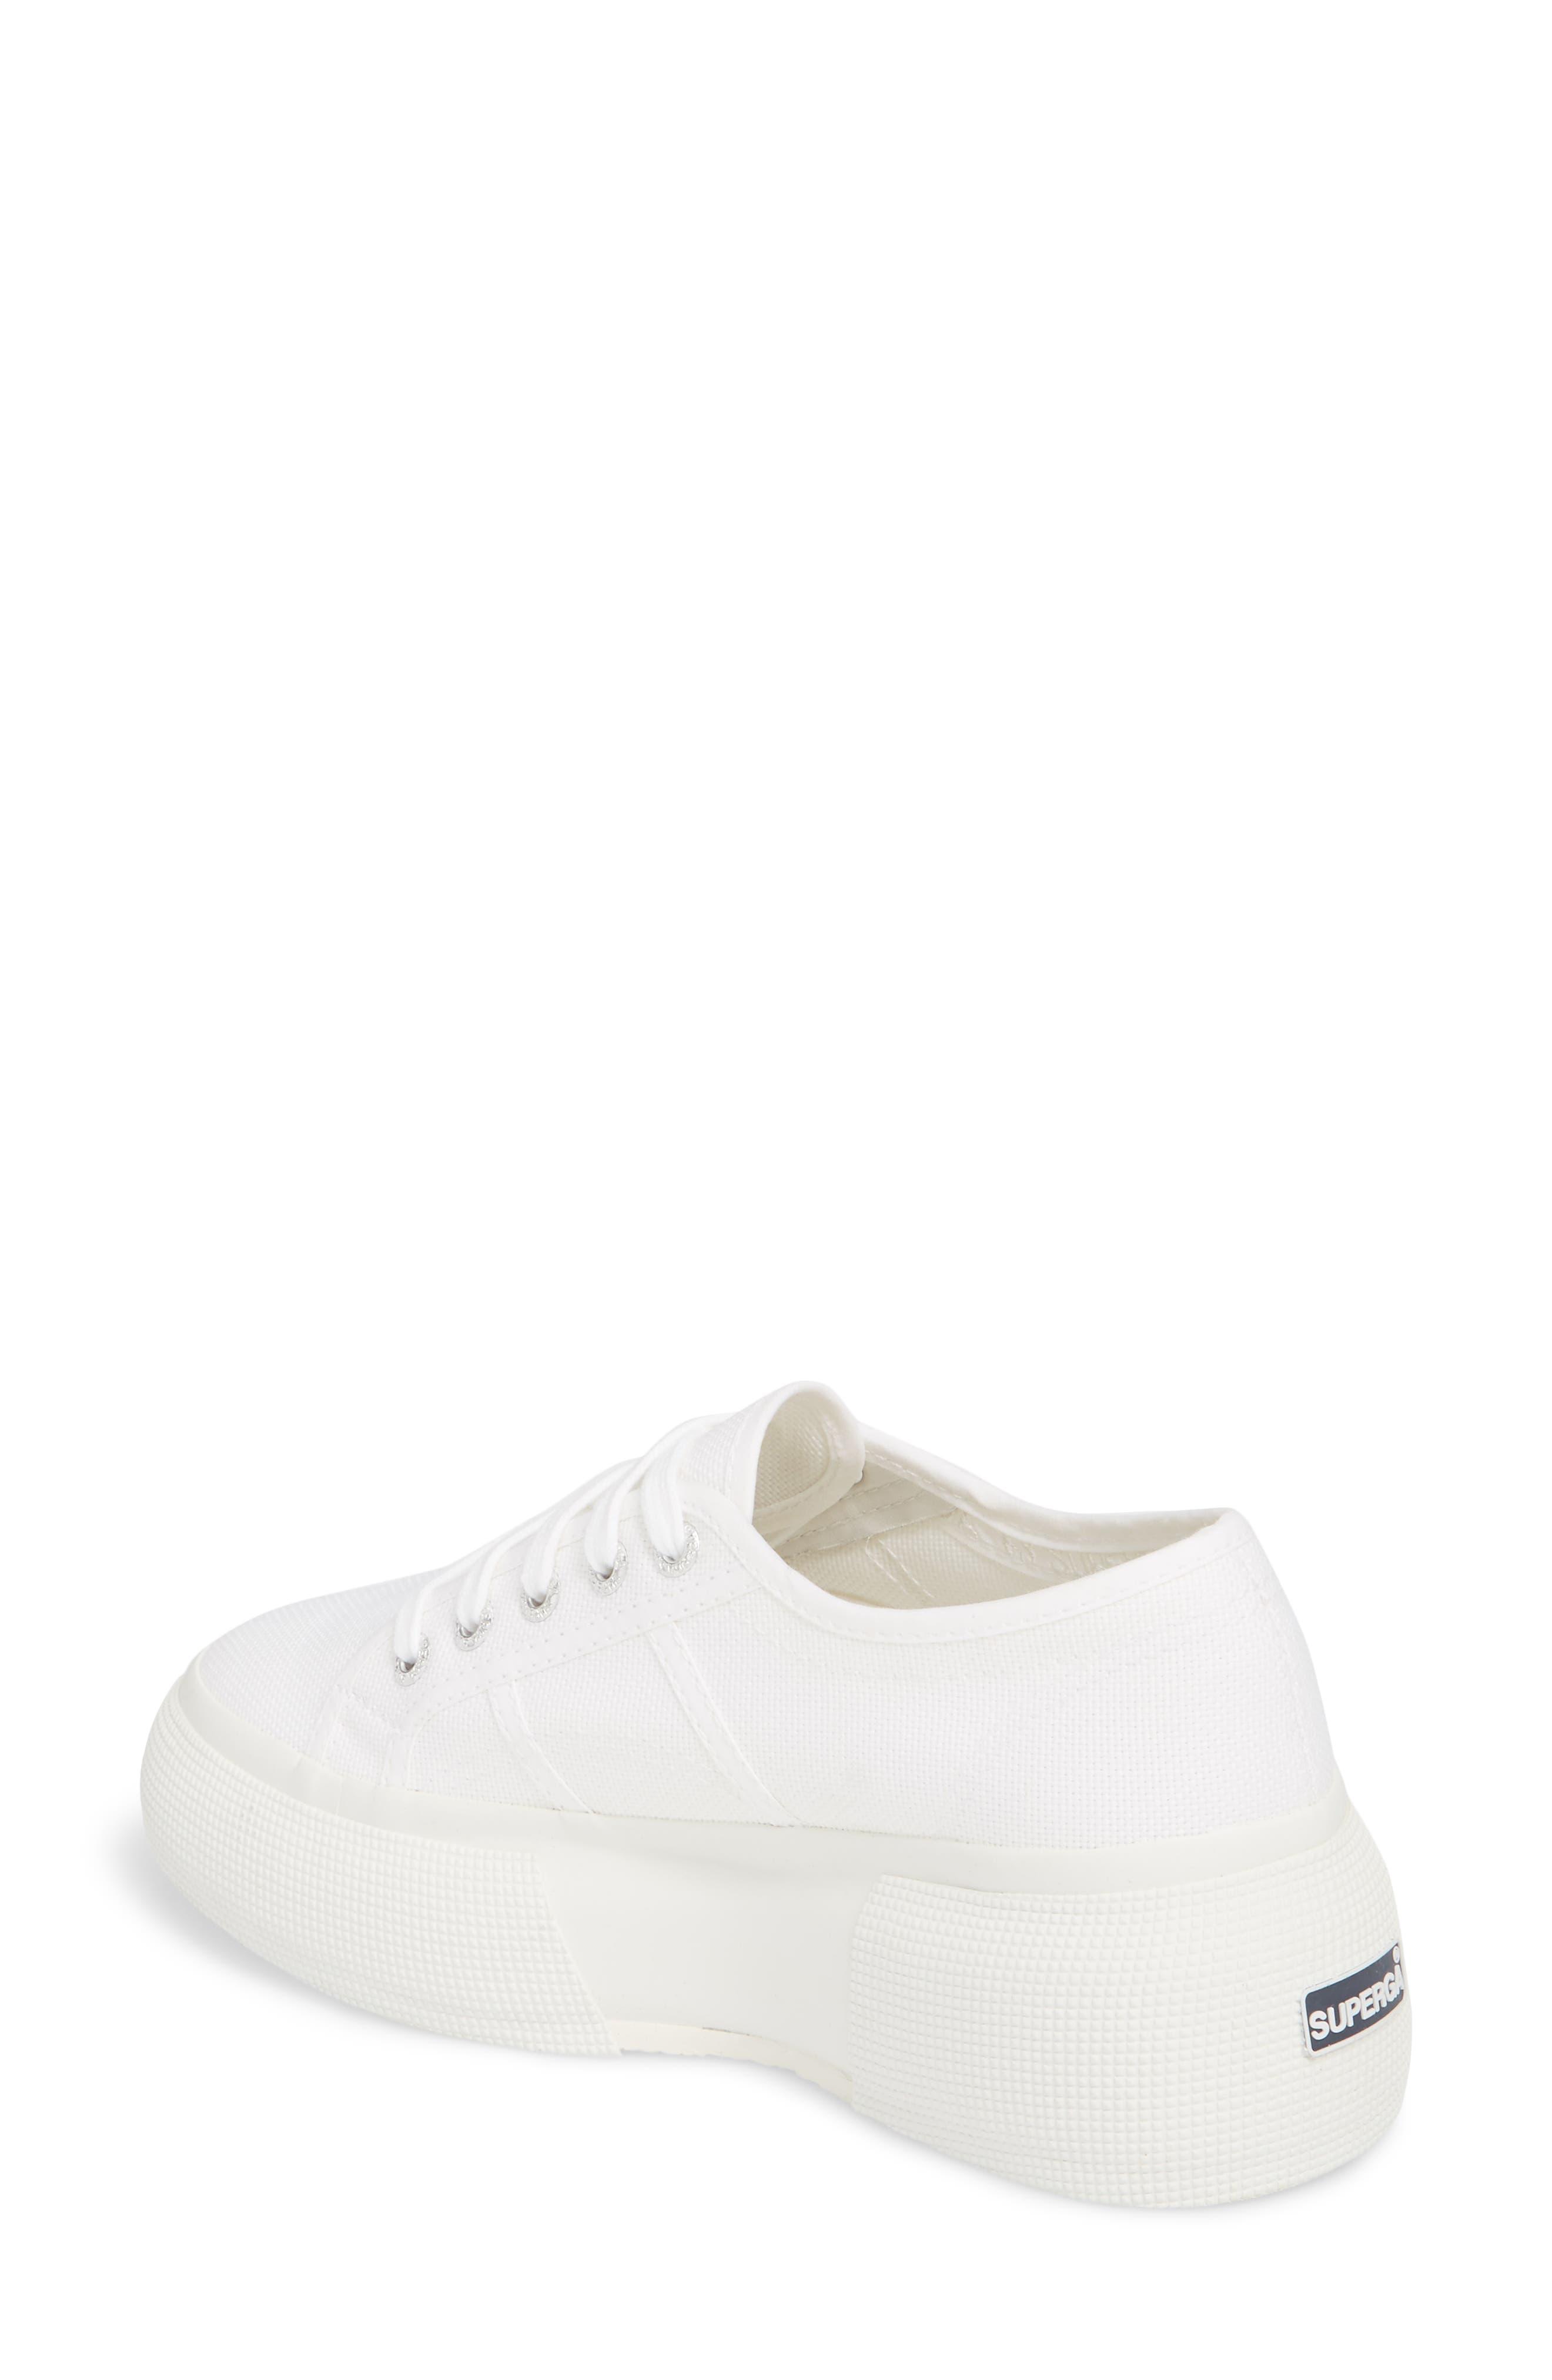 2287 Cotu Platform Sneaker,                             Alternate thumbnail 2, color,                             White